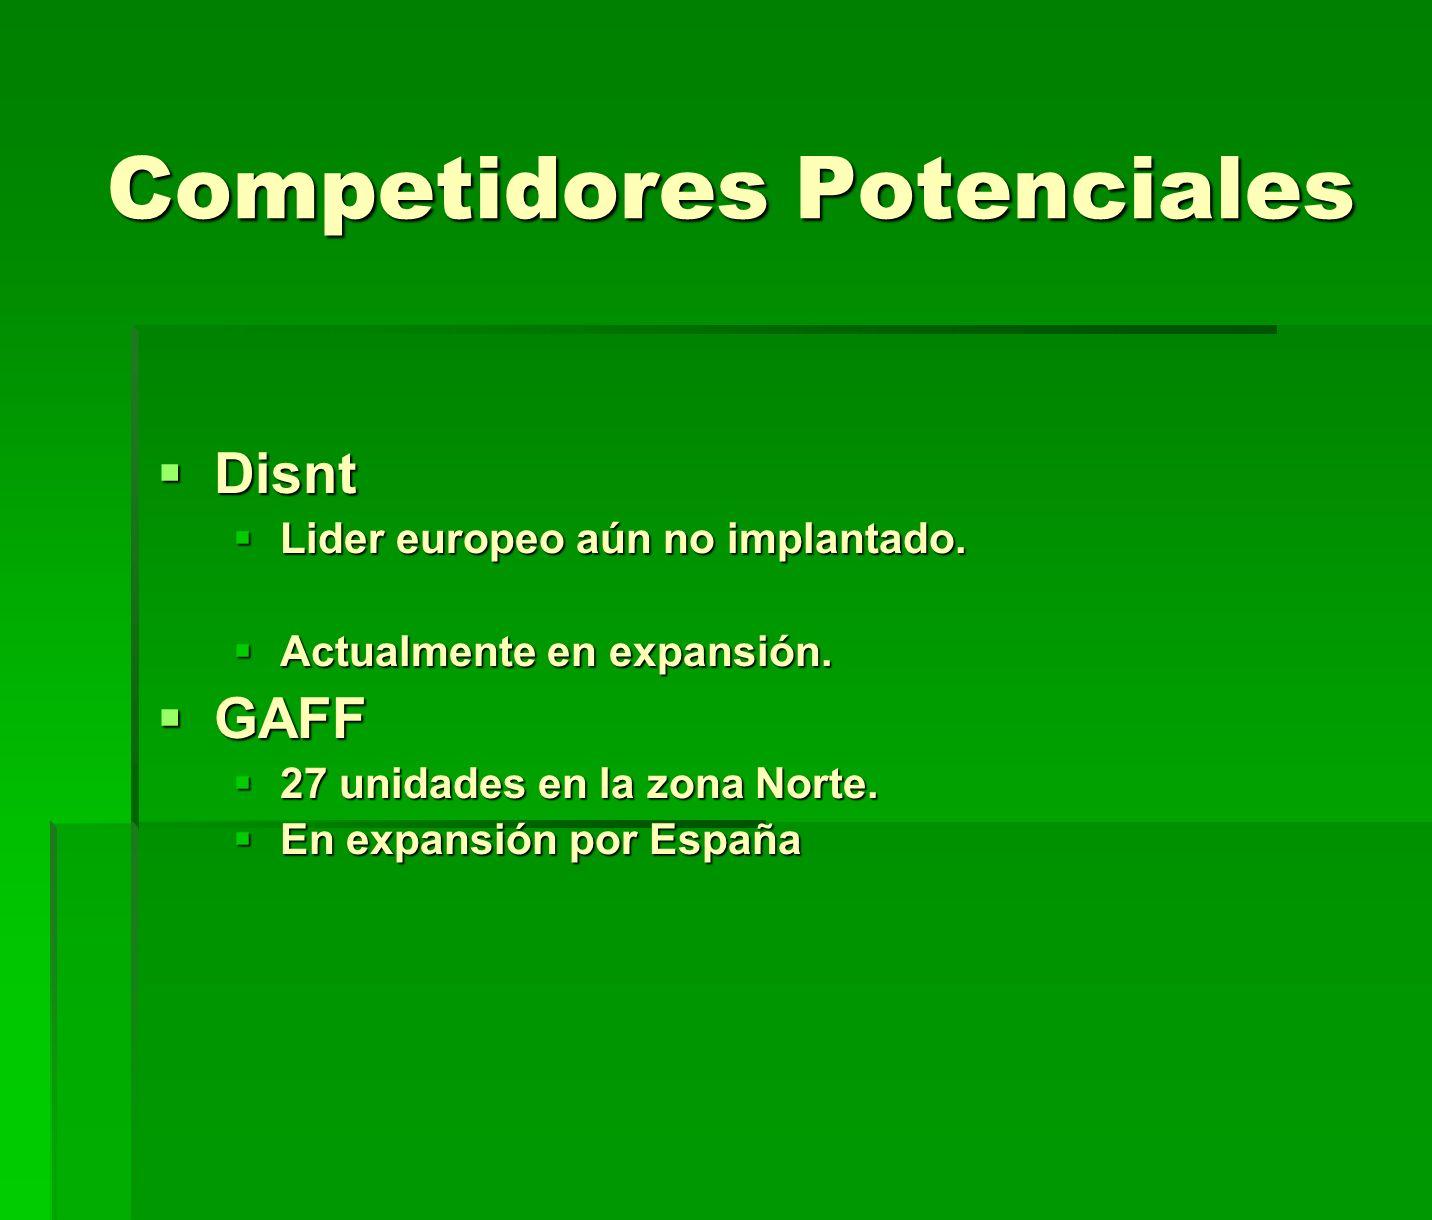 Competidores Potenciales Competidores Potenciales Disnt Disnt Lider europeo aún no implantado. Lider europeo aún no implantado. Actualmente en expansi